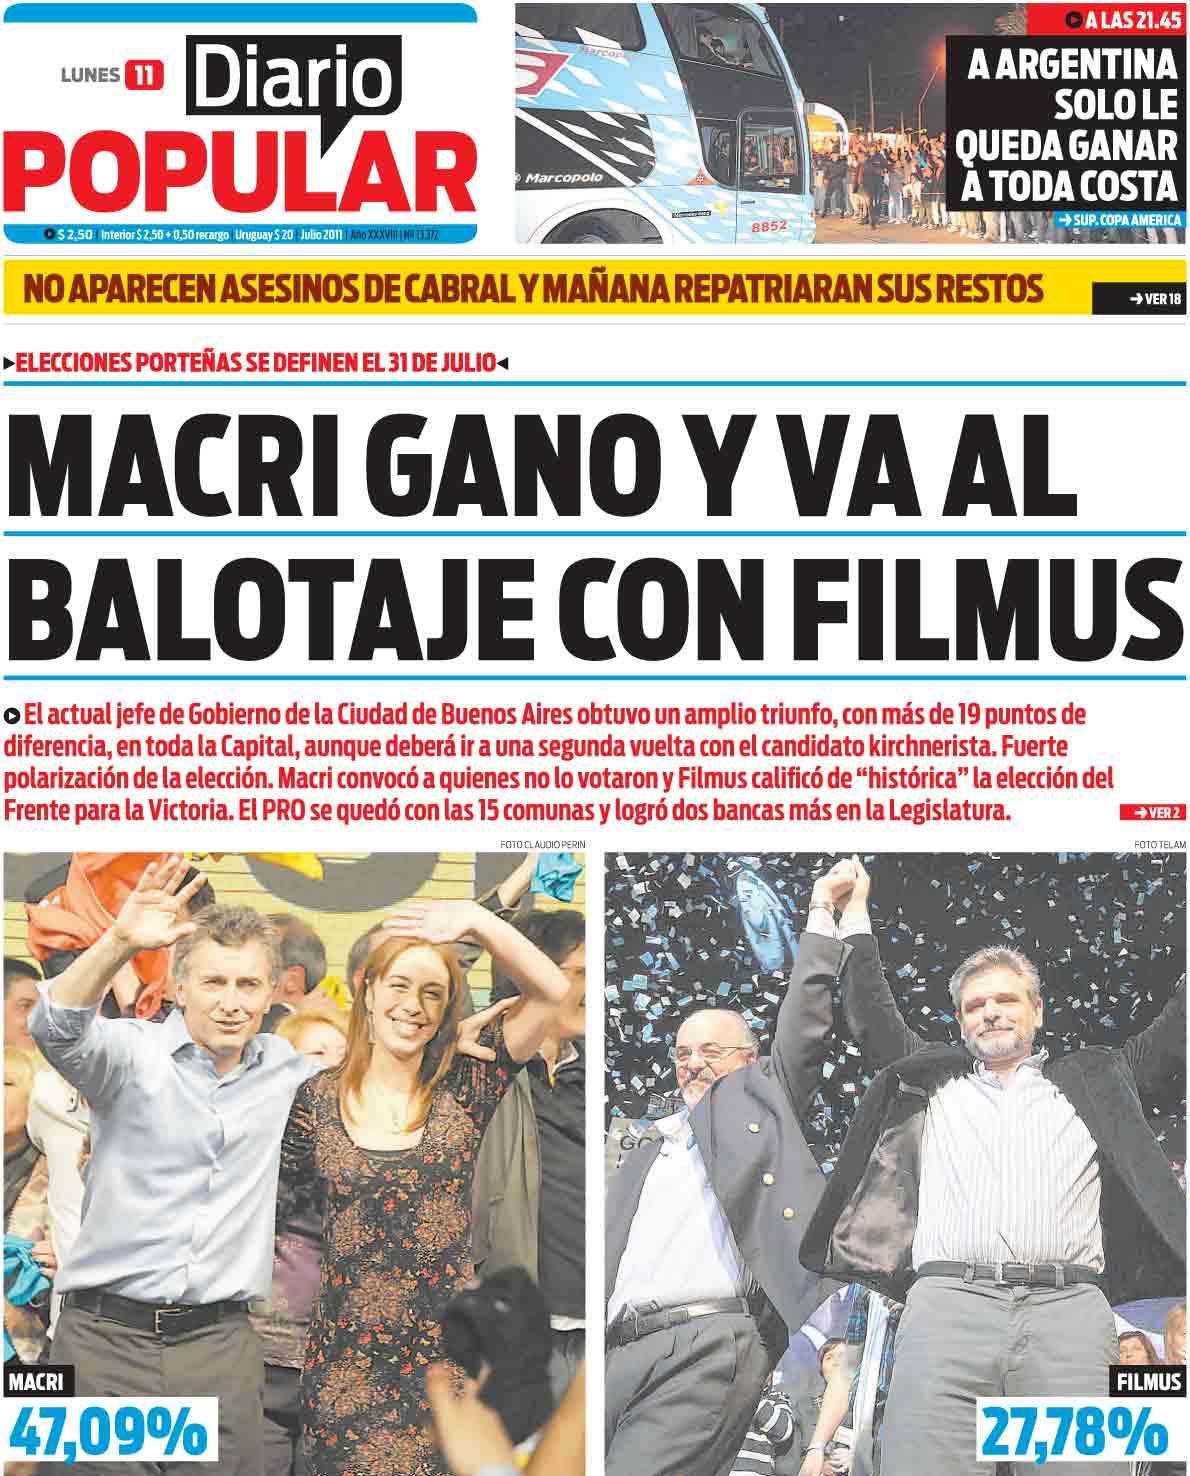 Tapa diarios cronica popular 11 07 11 report show for Diario el show del espectaculo